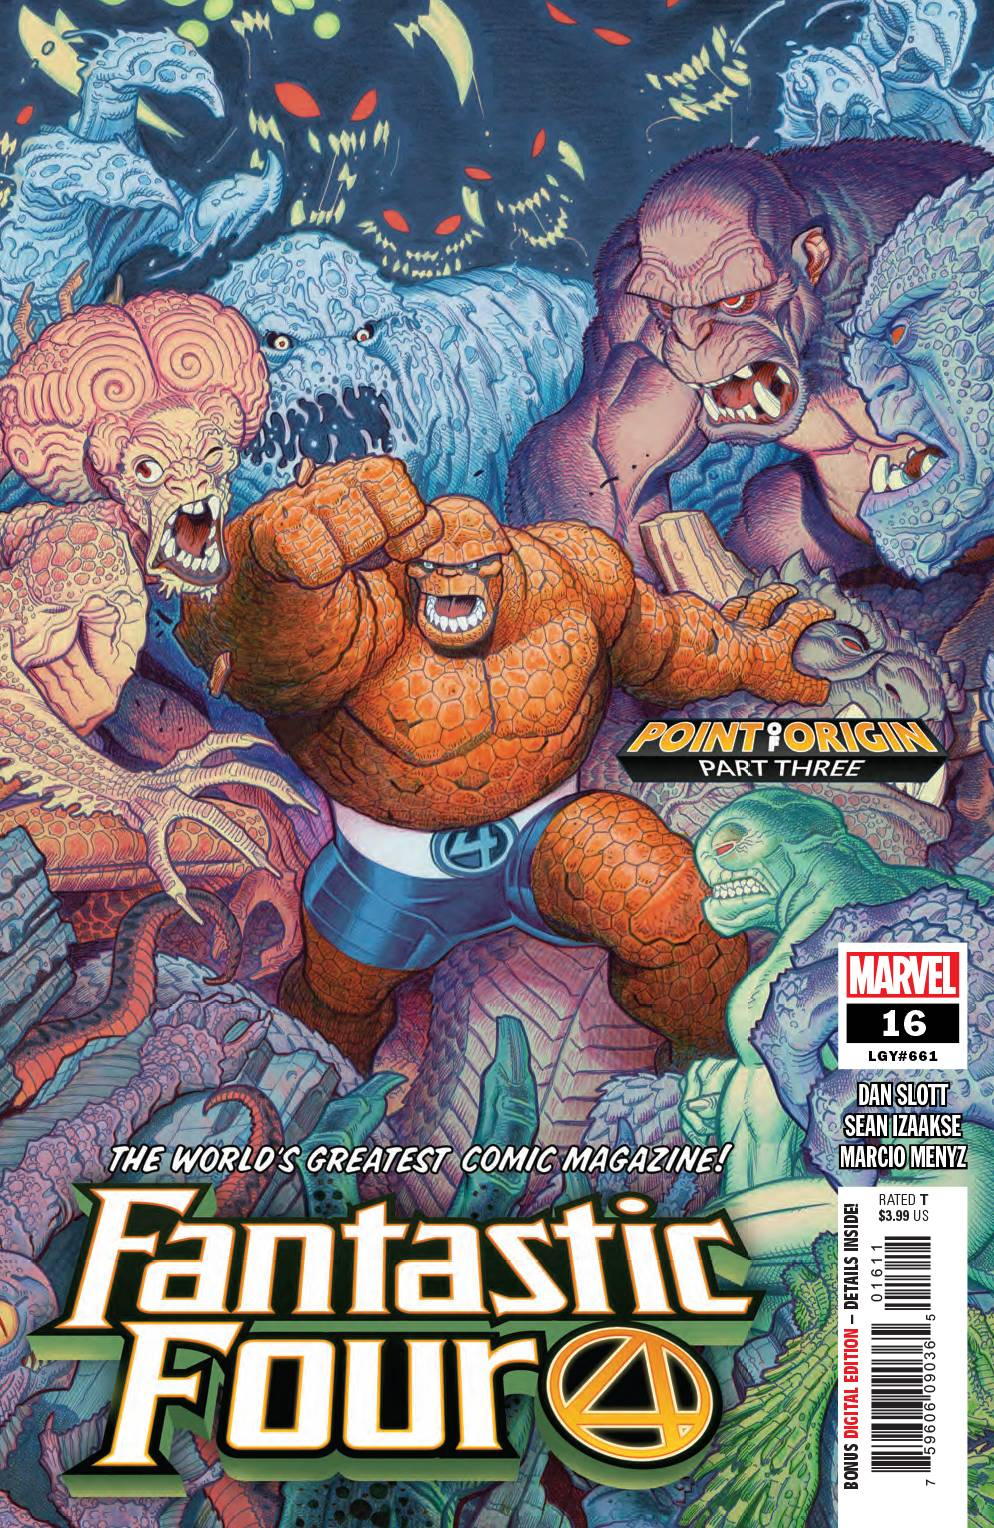 Fantastic Four #16 (2019)